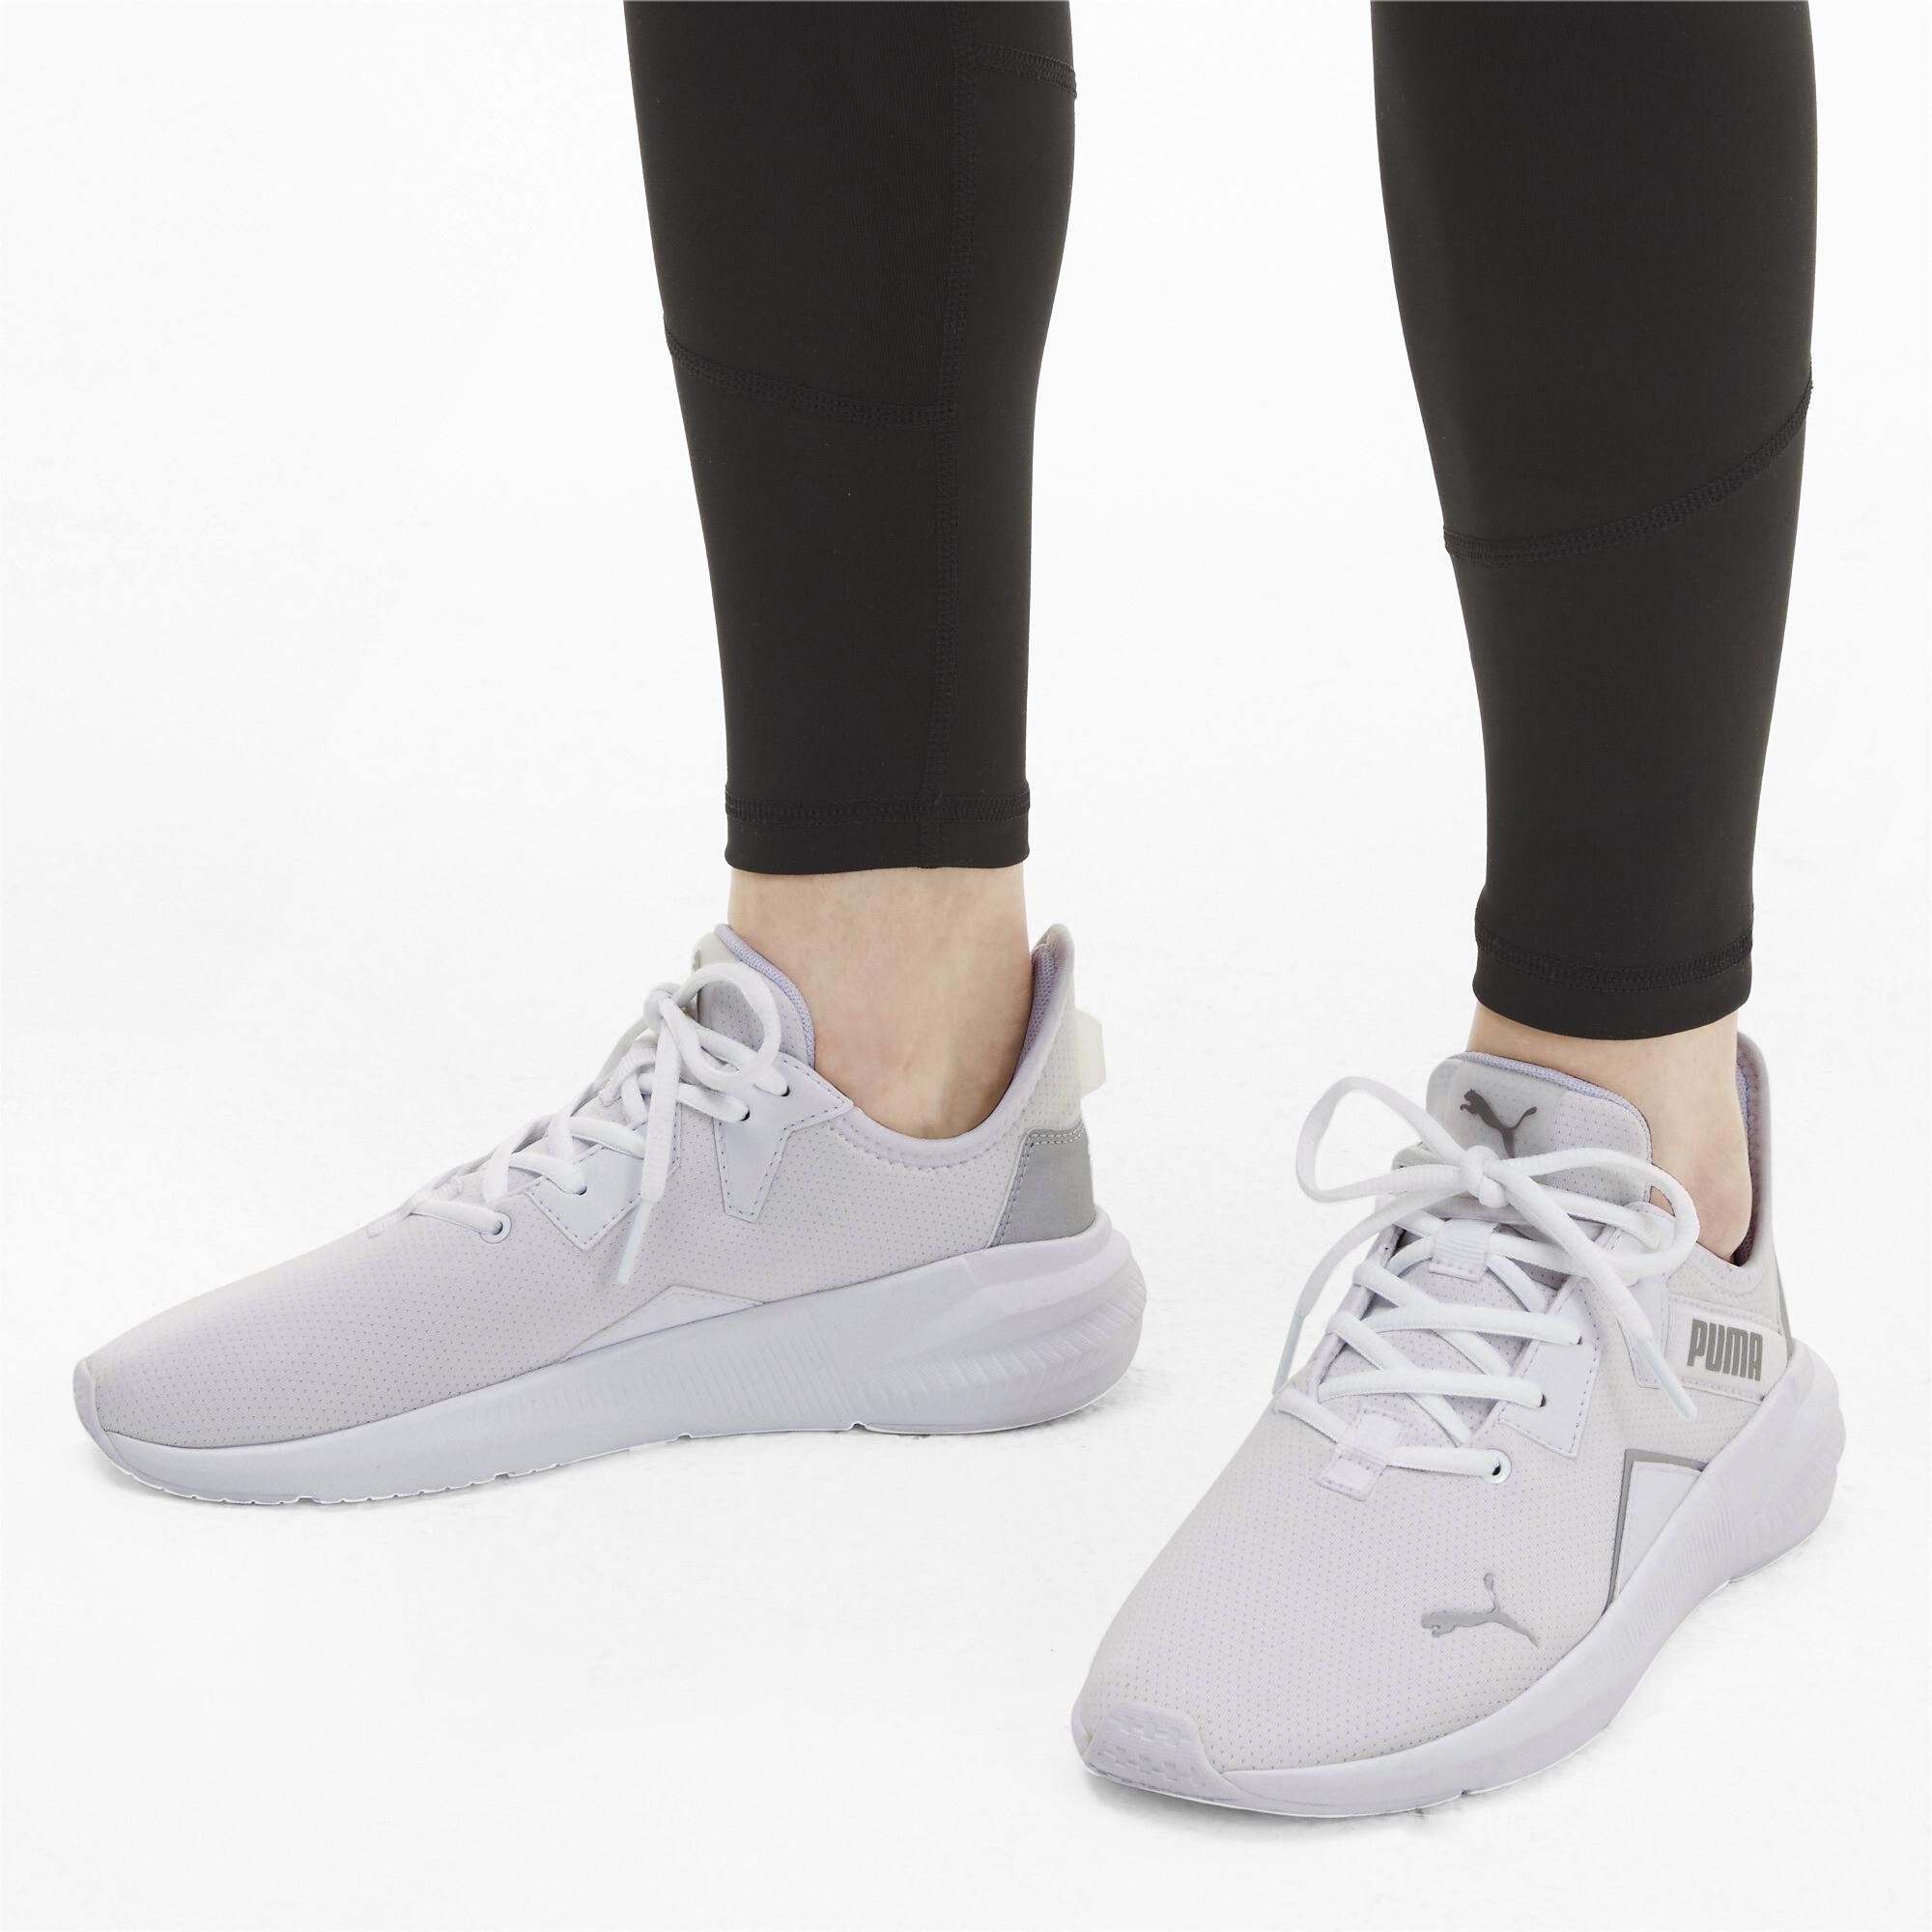 thumbnail 26 - PUMA-Women-039-s-Platinum-Training-Shoes